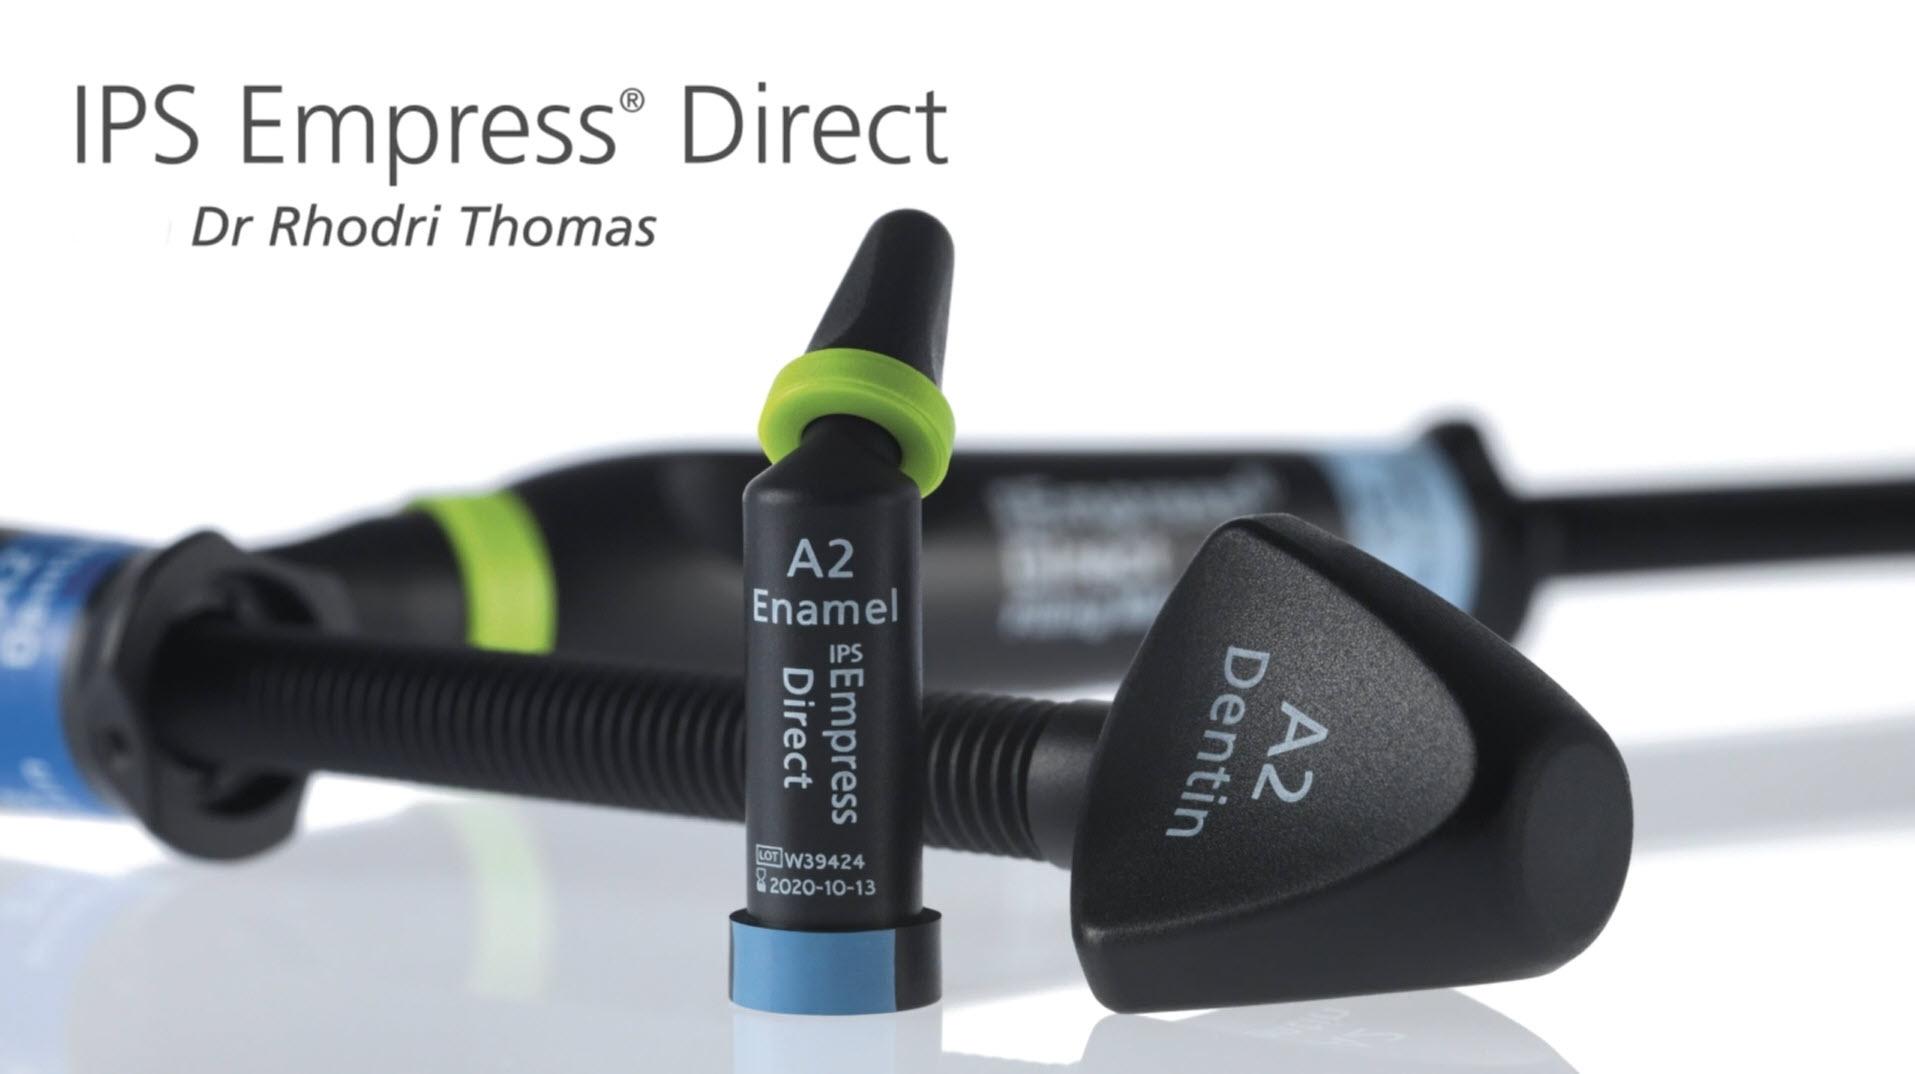 102_ZA_IPS Empress Direct_Interview_Dr. Rhodri Thomas_DE_720p